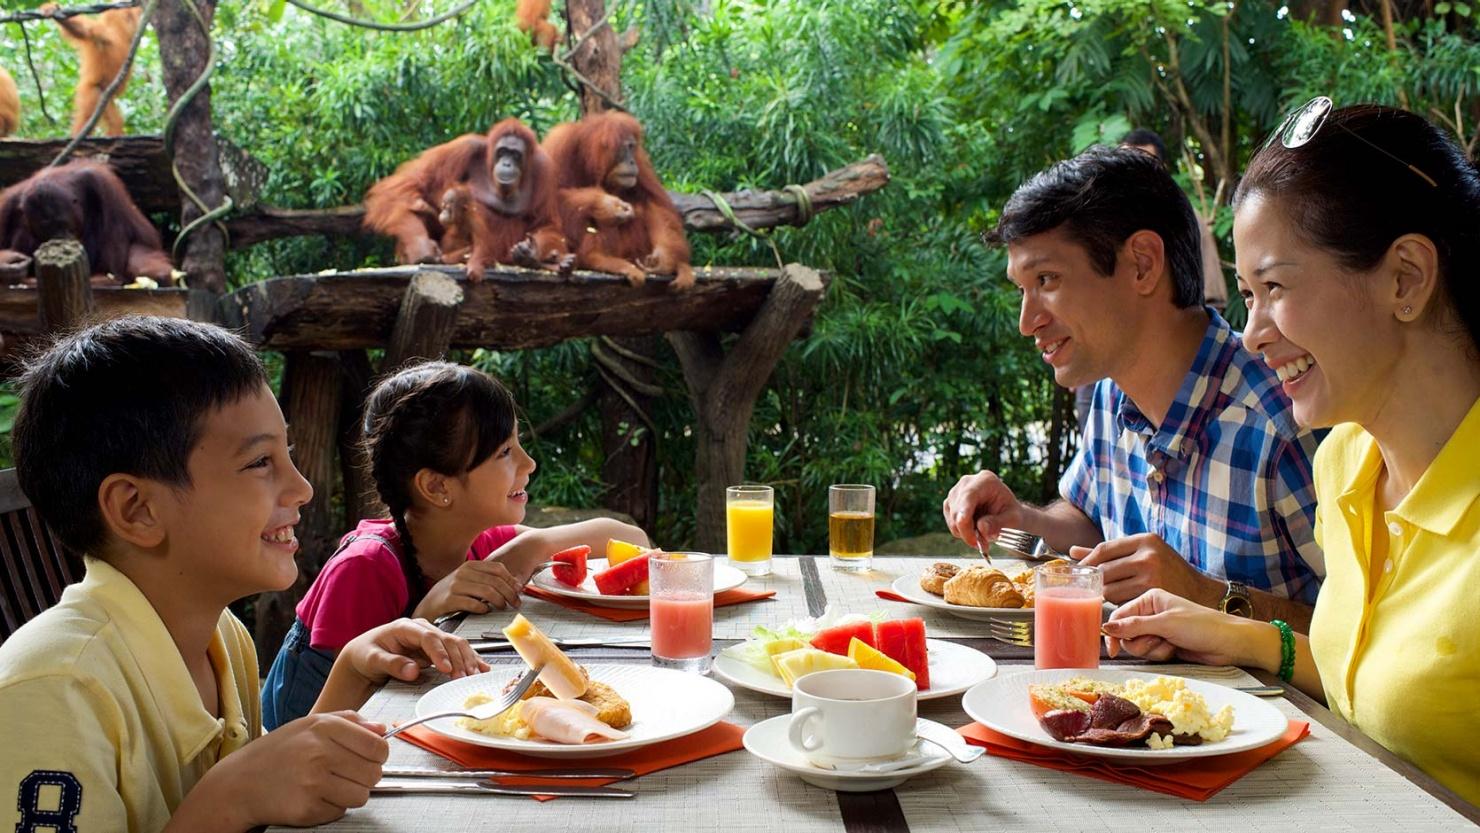 Nikmati santapan keluarga bersama orangutan di Singapore Zoo.